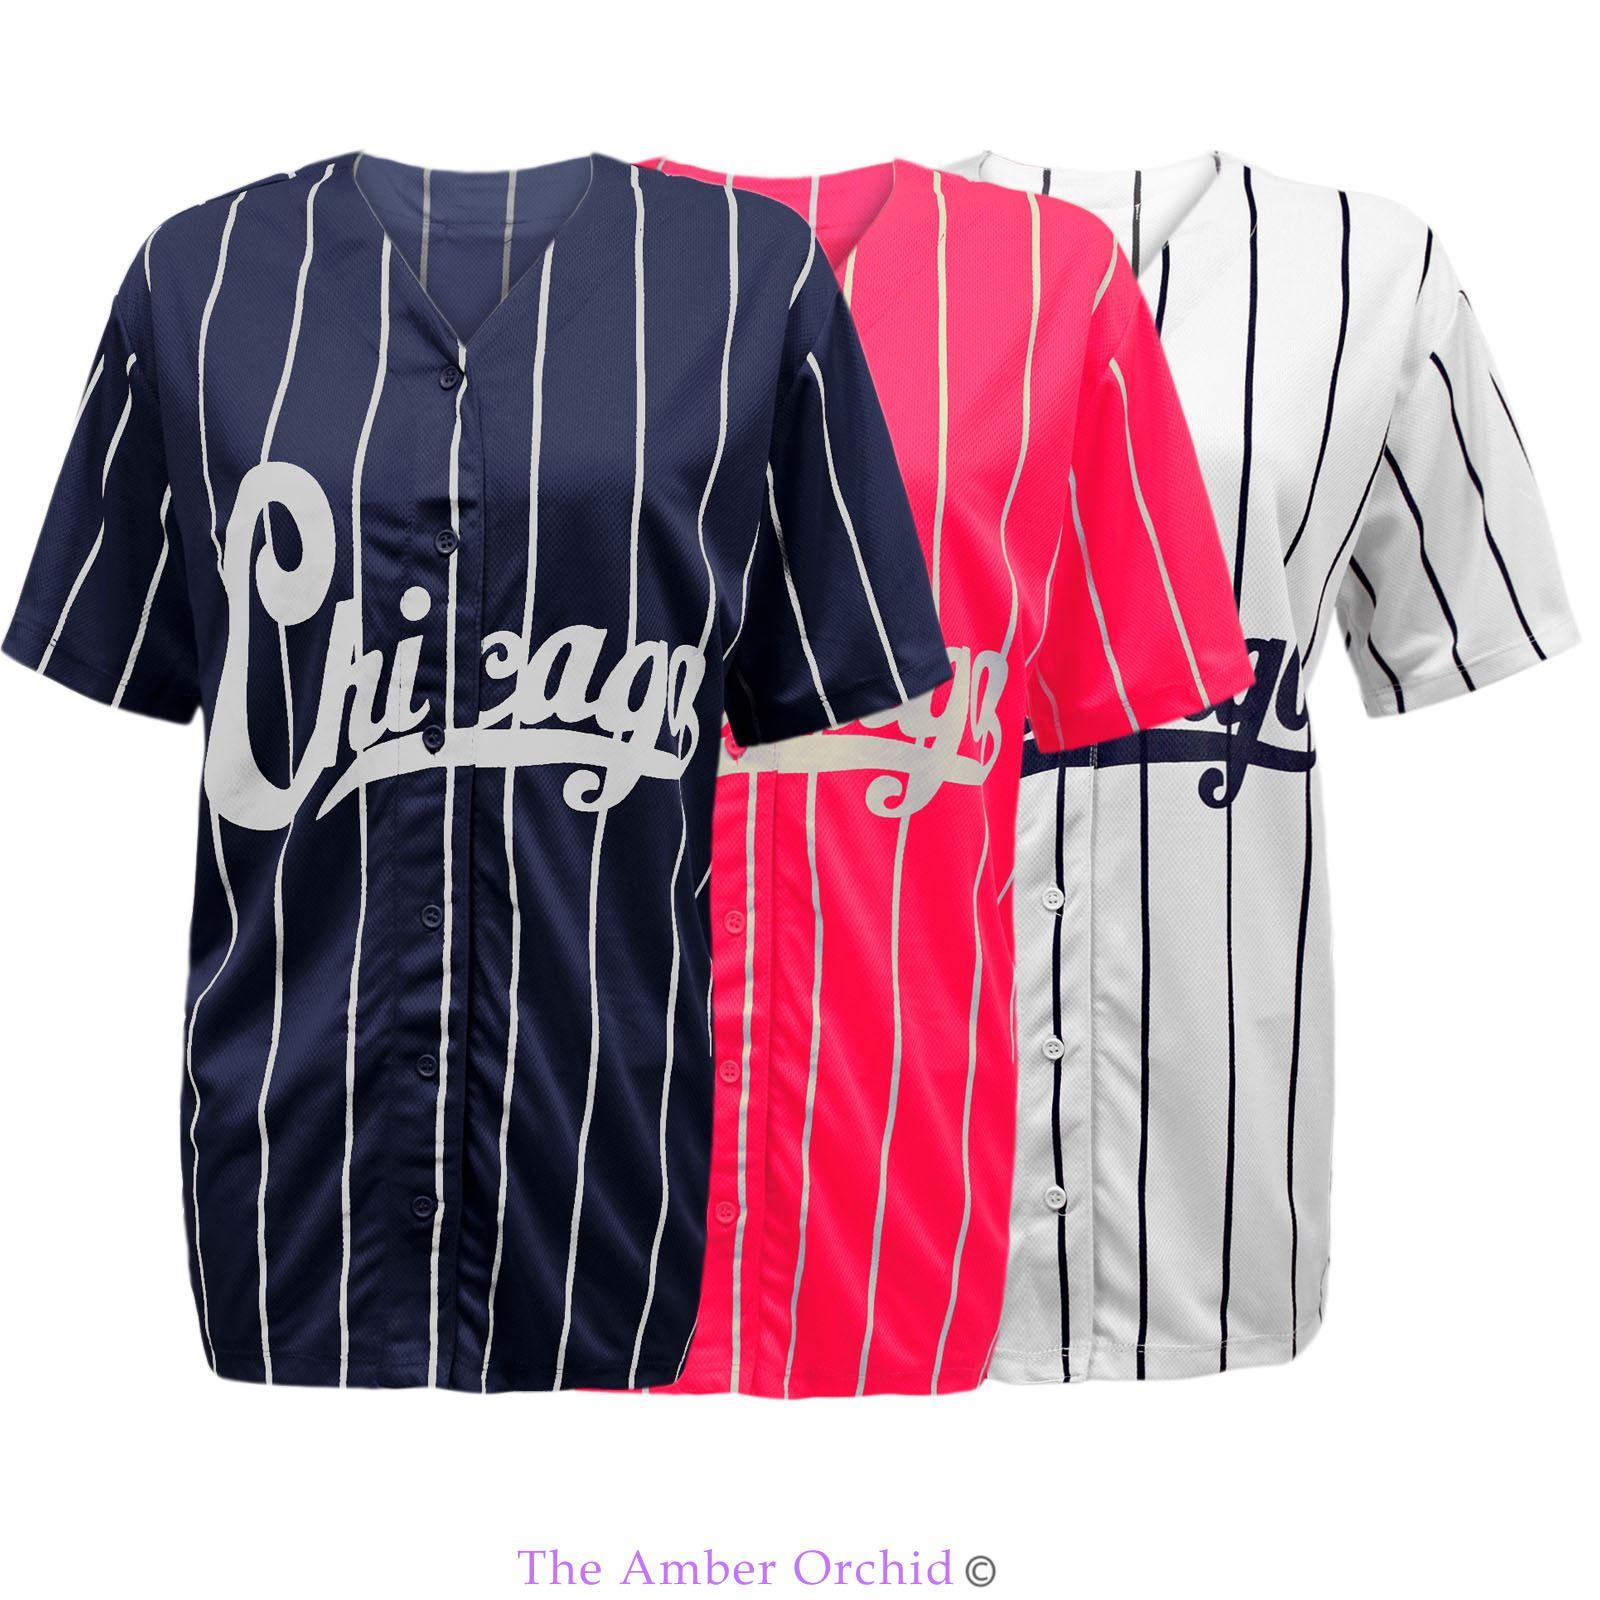 new womens ladies chicago varsity stripes american baseball jersey top t shirt ebay. Black Bedroom Furniture Sets. Home Design Ideas